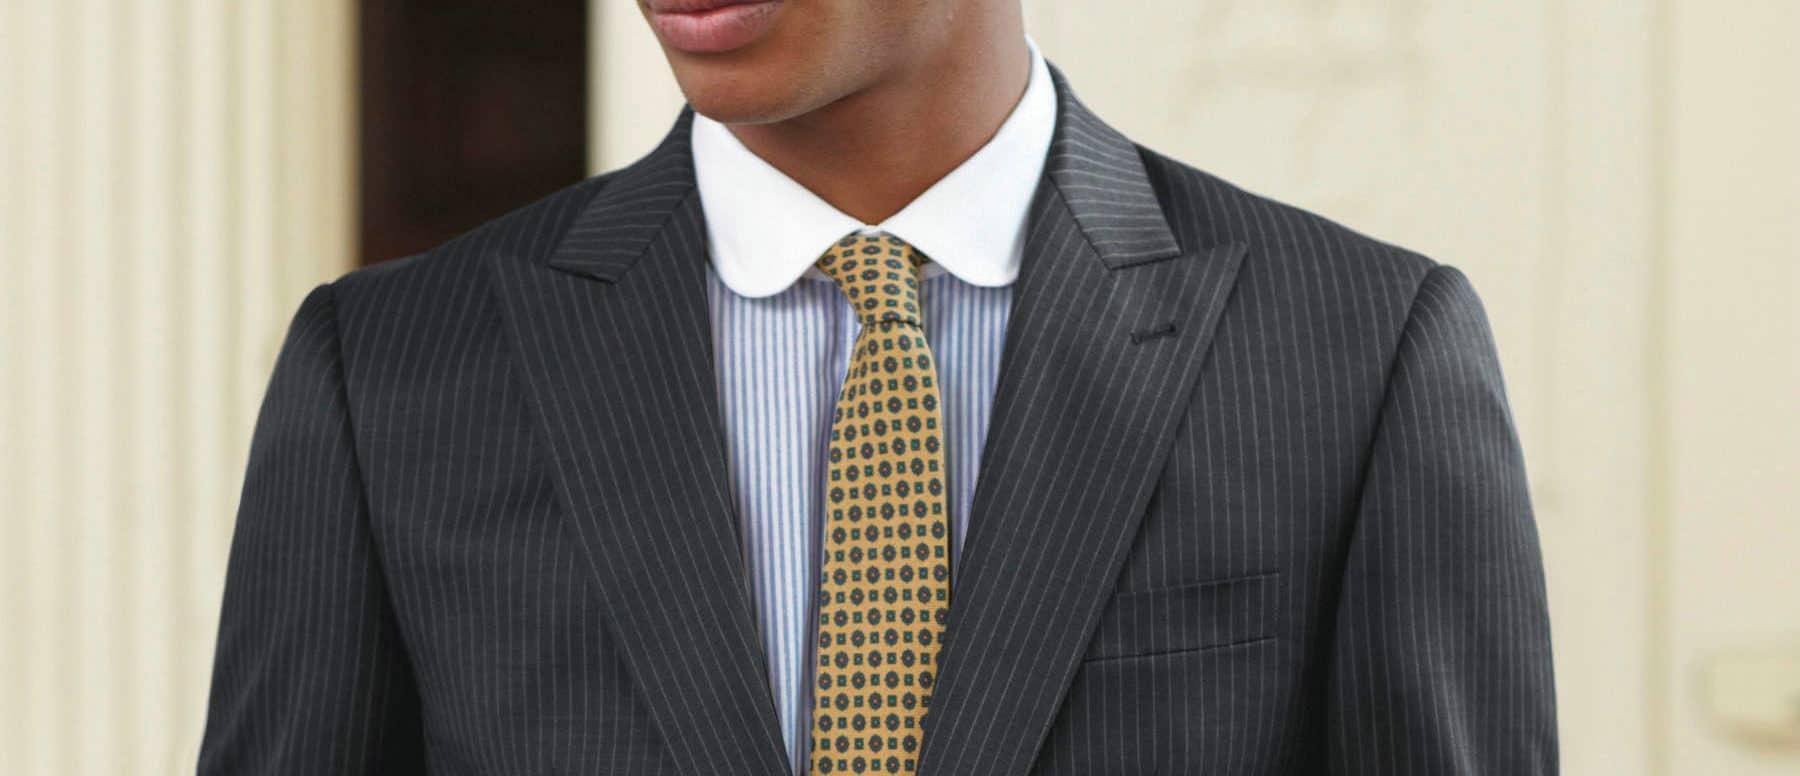 Peak Lapels – types of suits